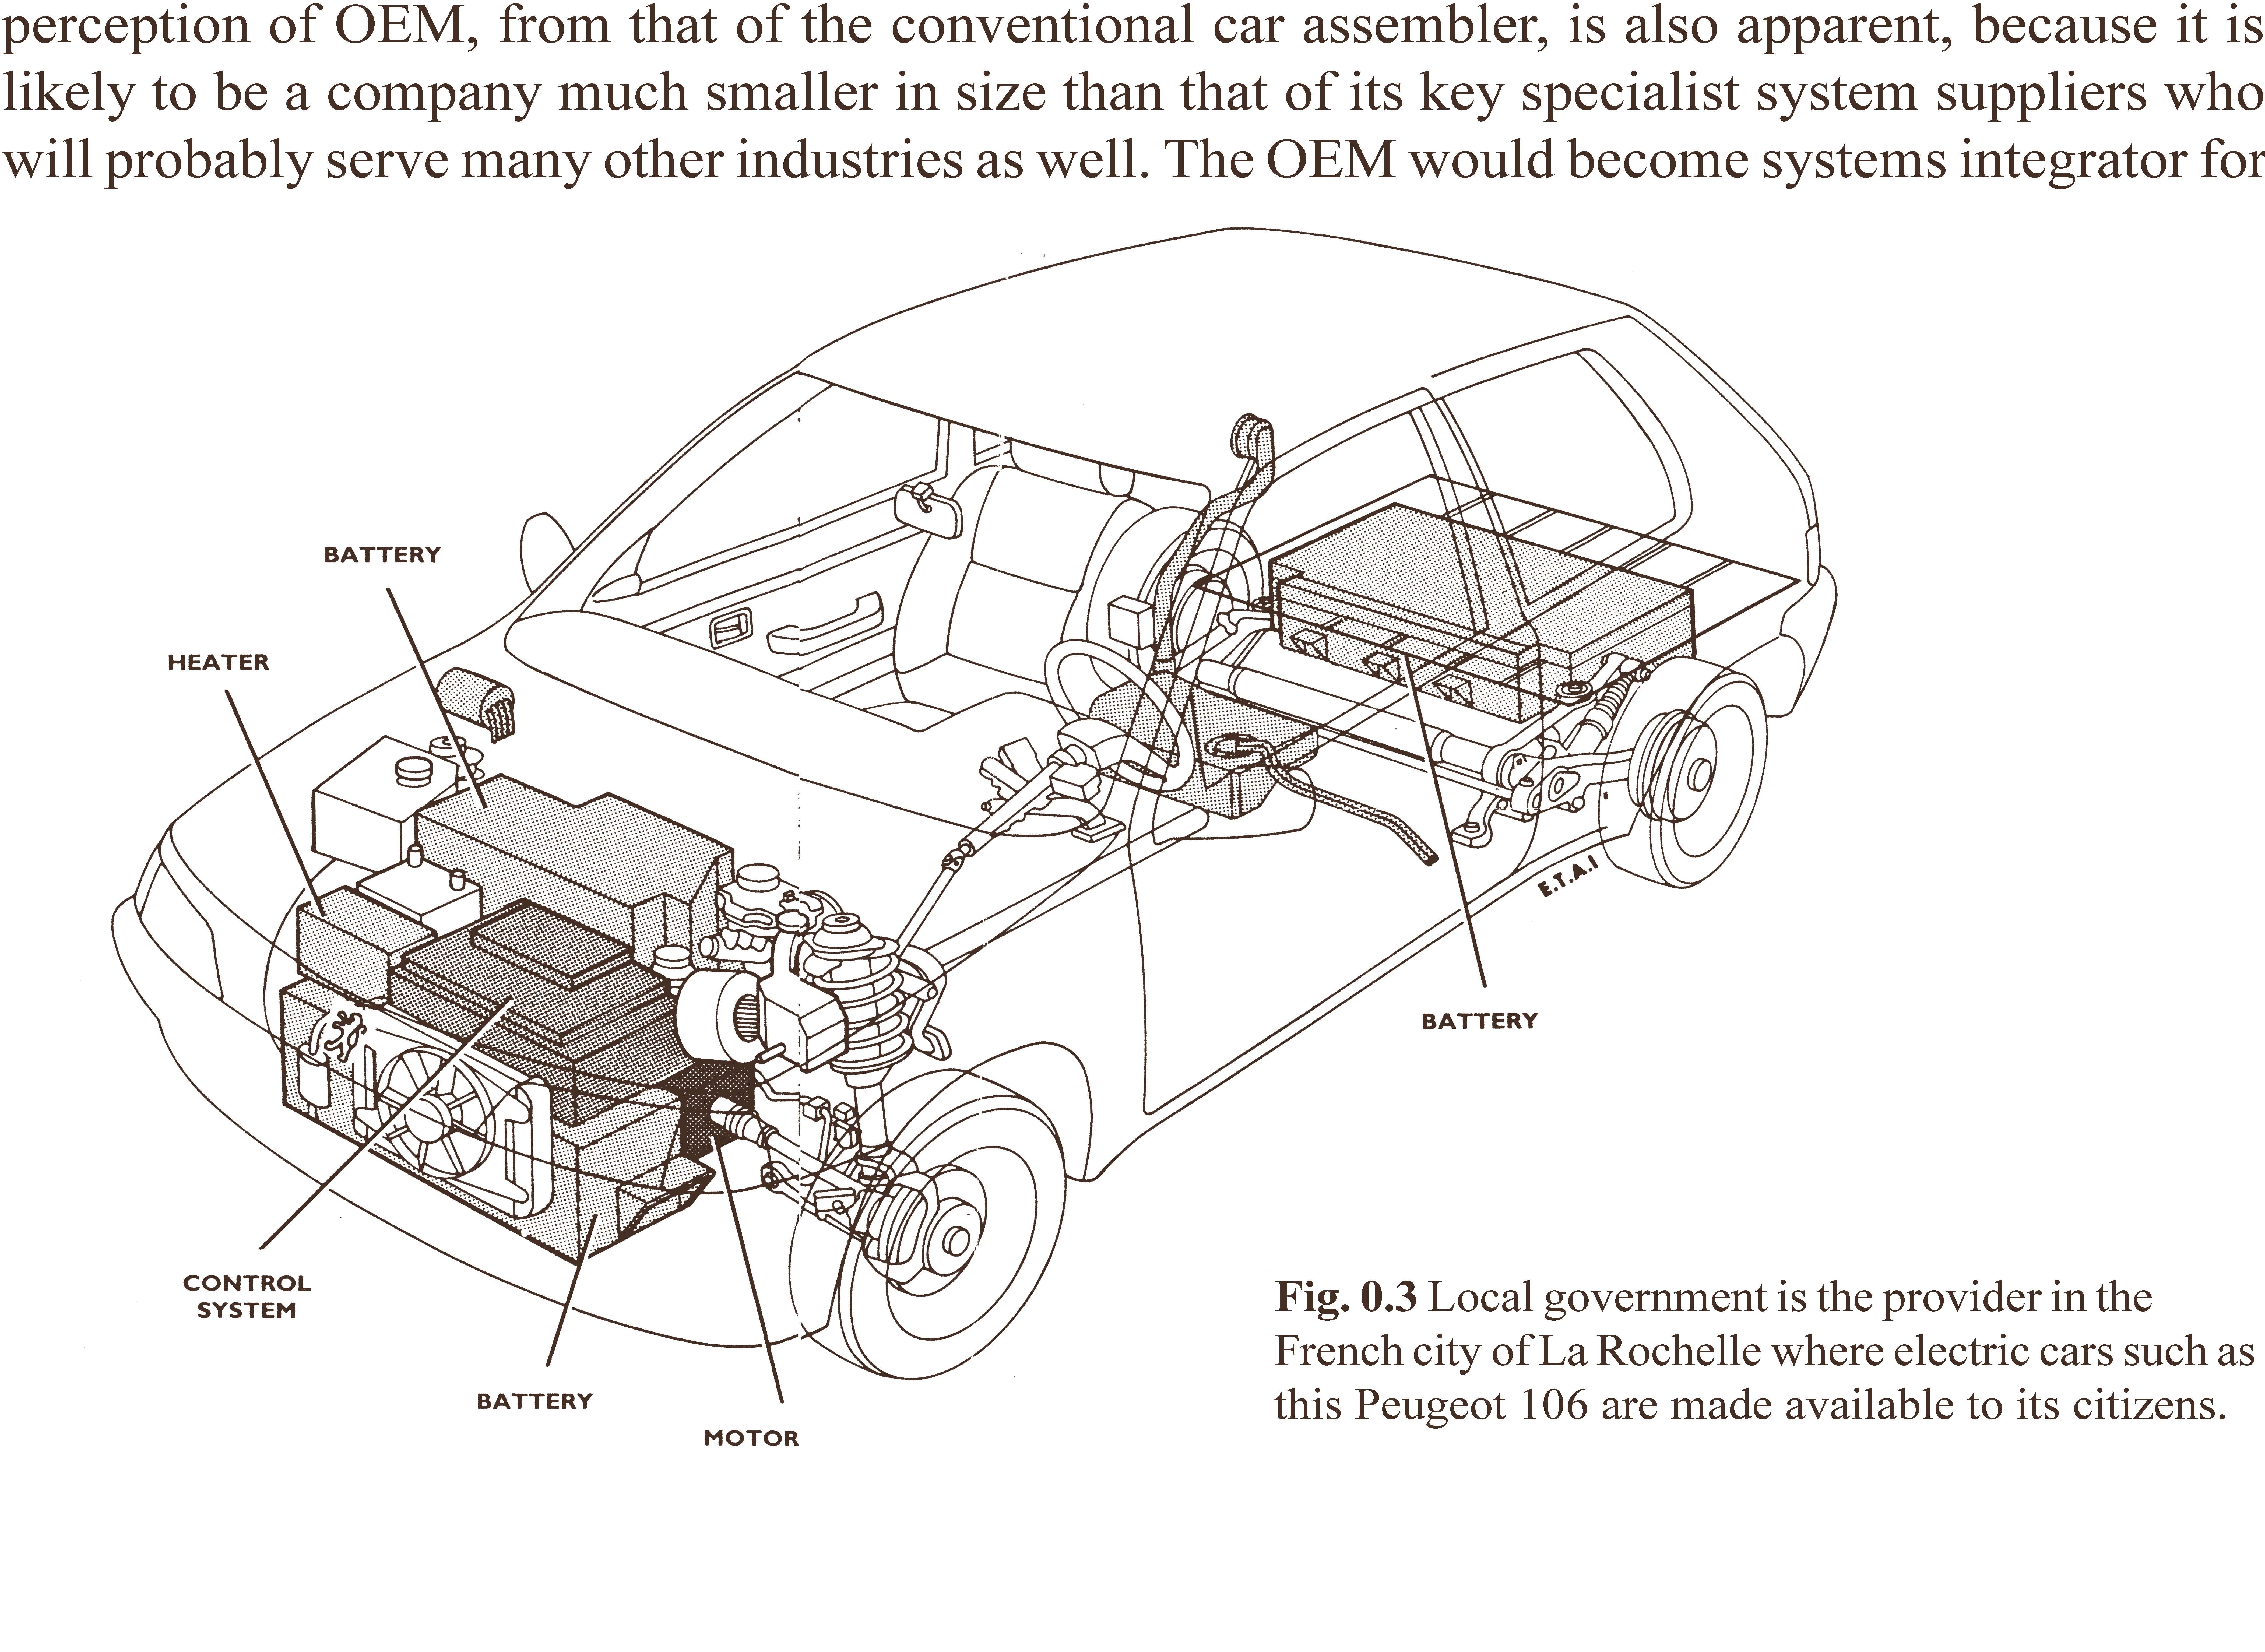 Drawn vehicle car design Ev periods their Vehicle between